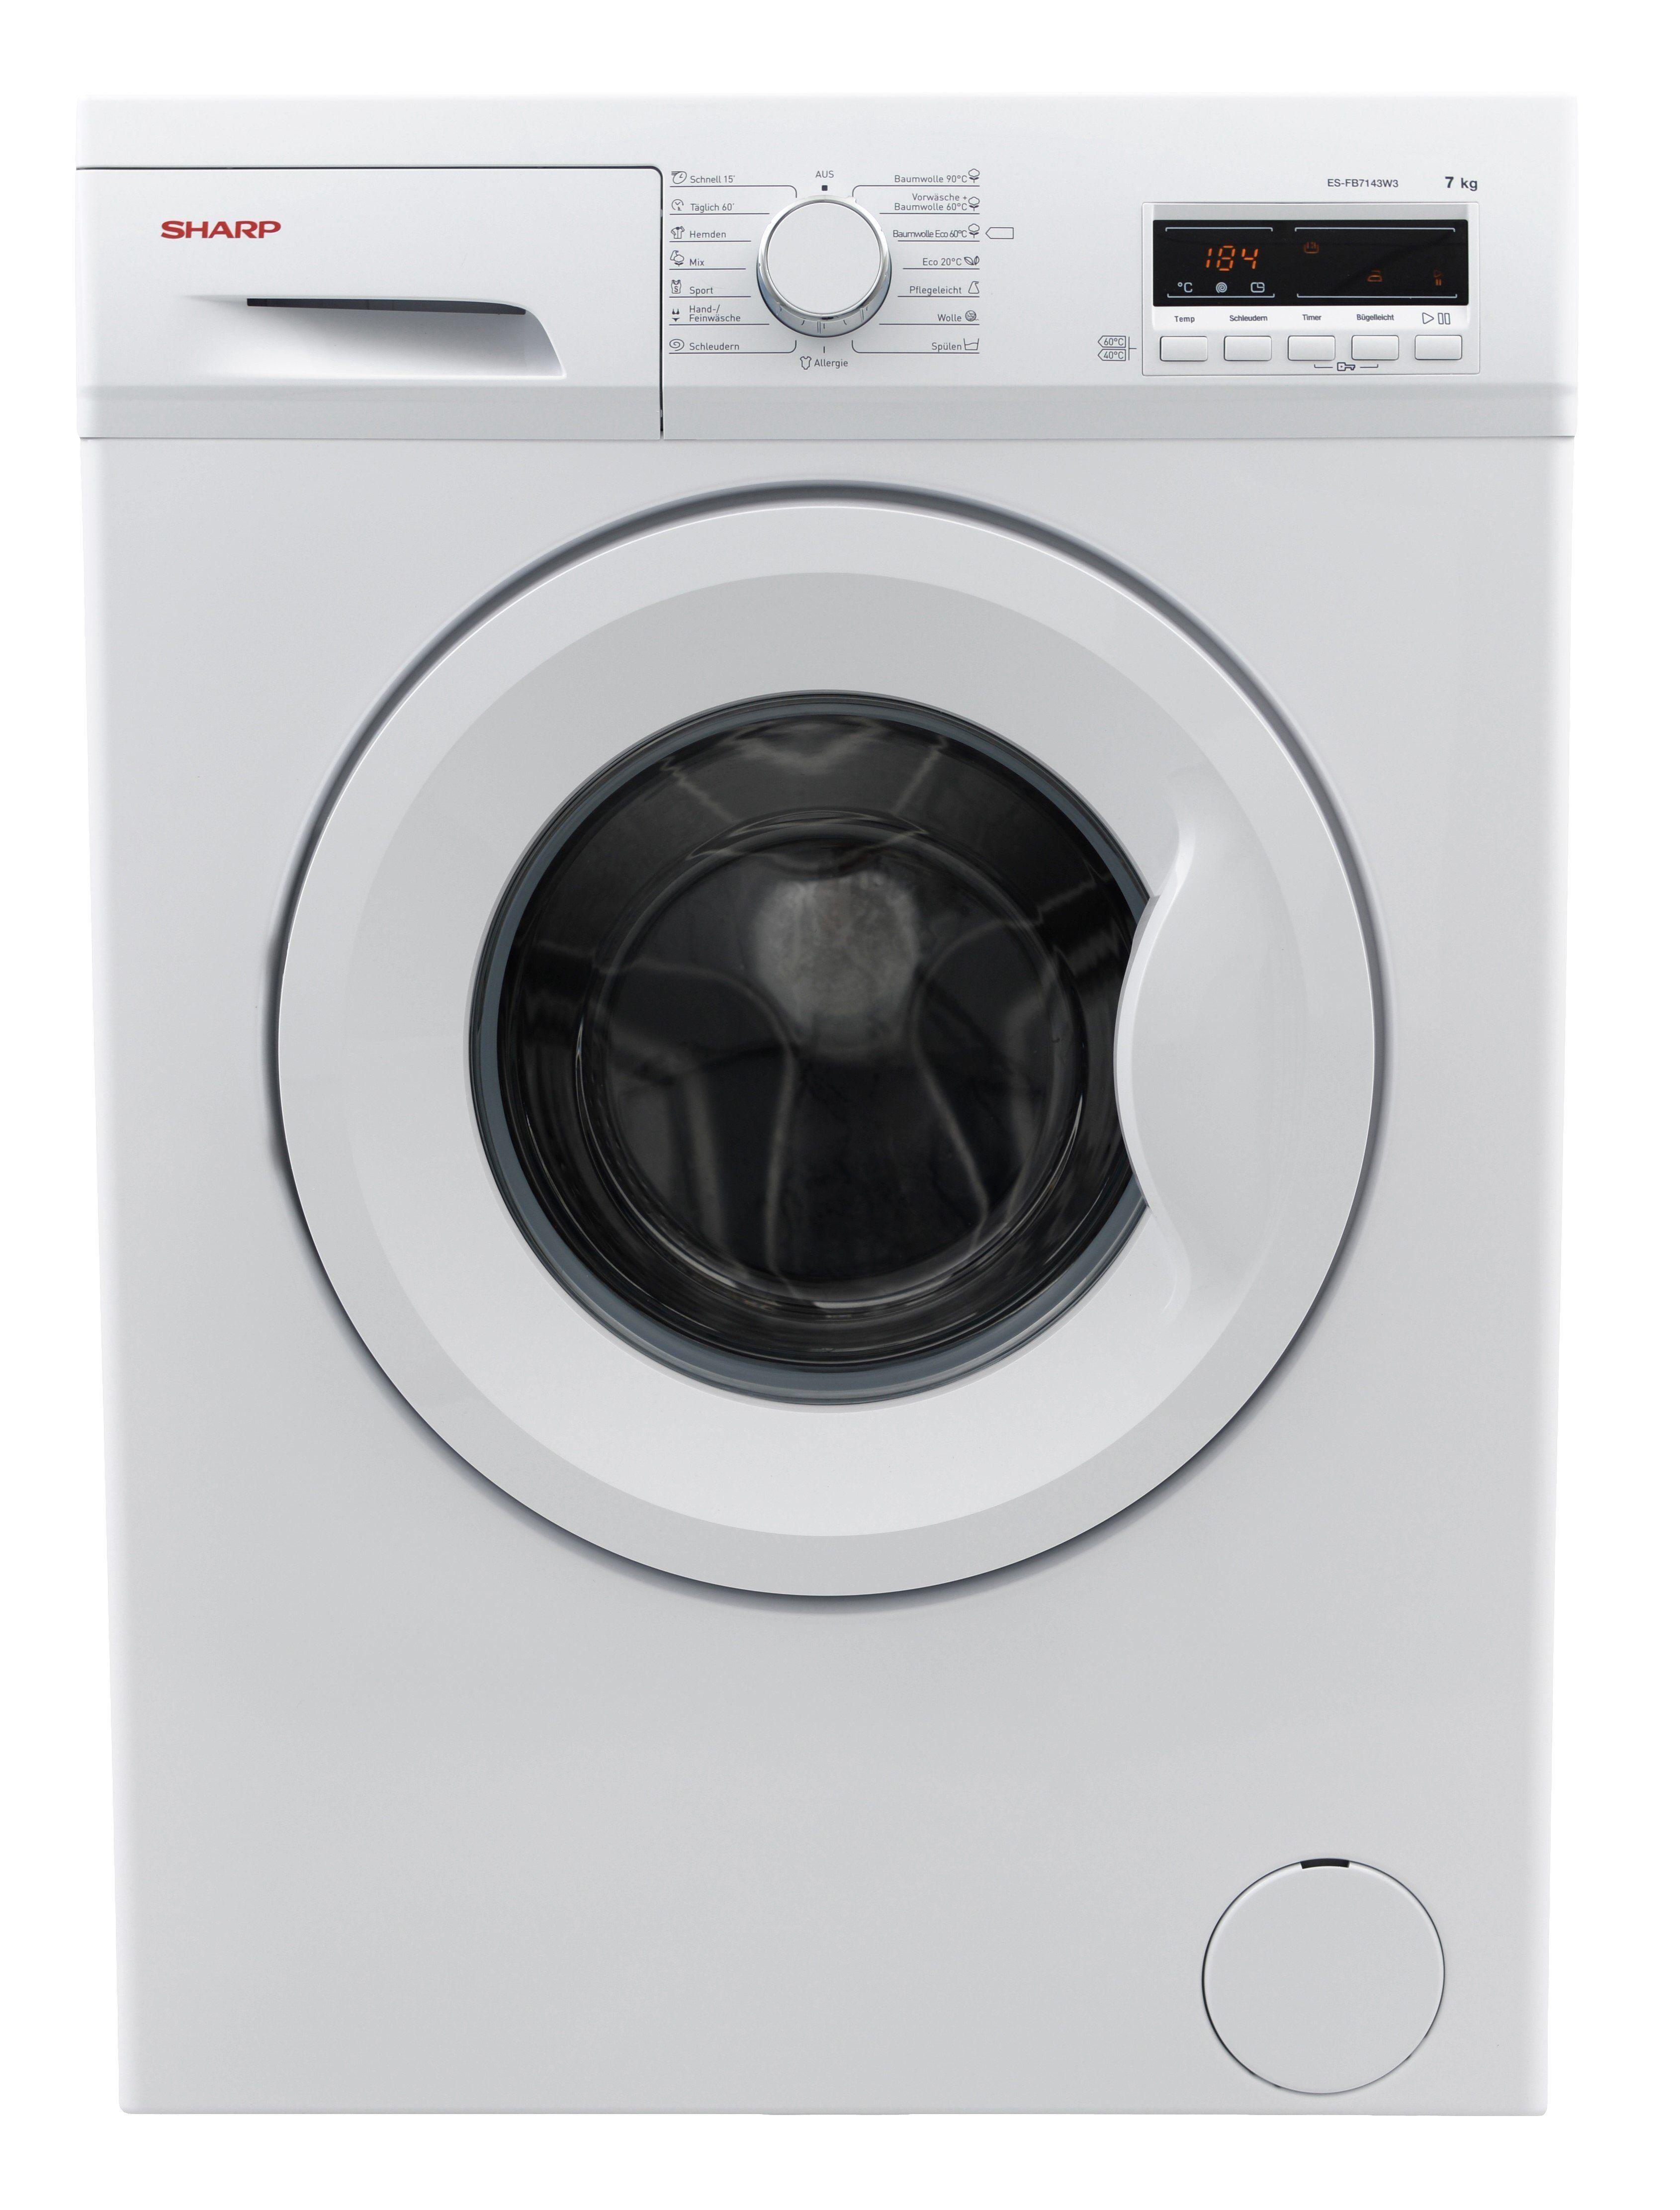 Sharp Waschmaschine ES-FB7143W3A-DE, 7 kg, 1400 U/Min, Energieeffizienzklasse A+++